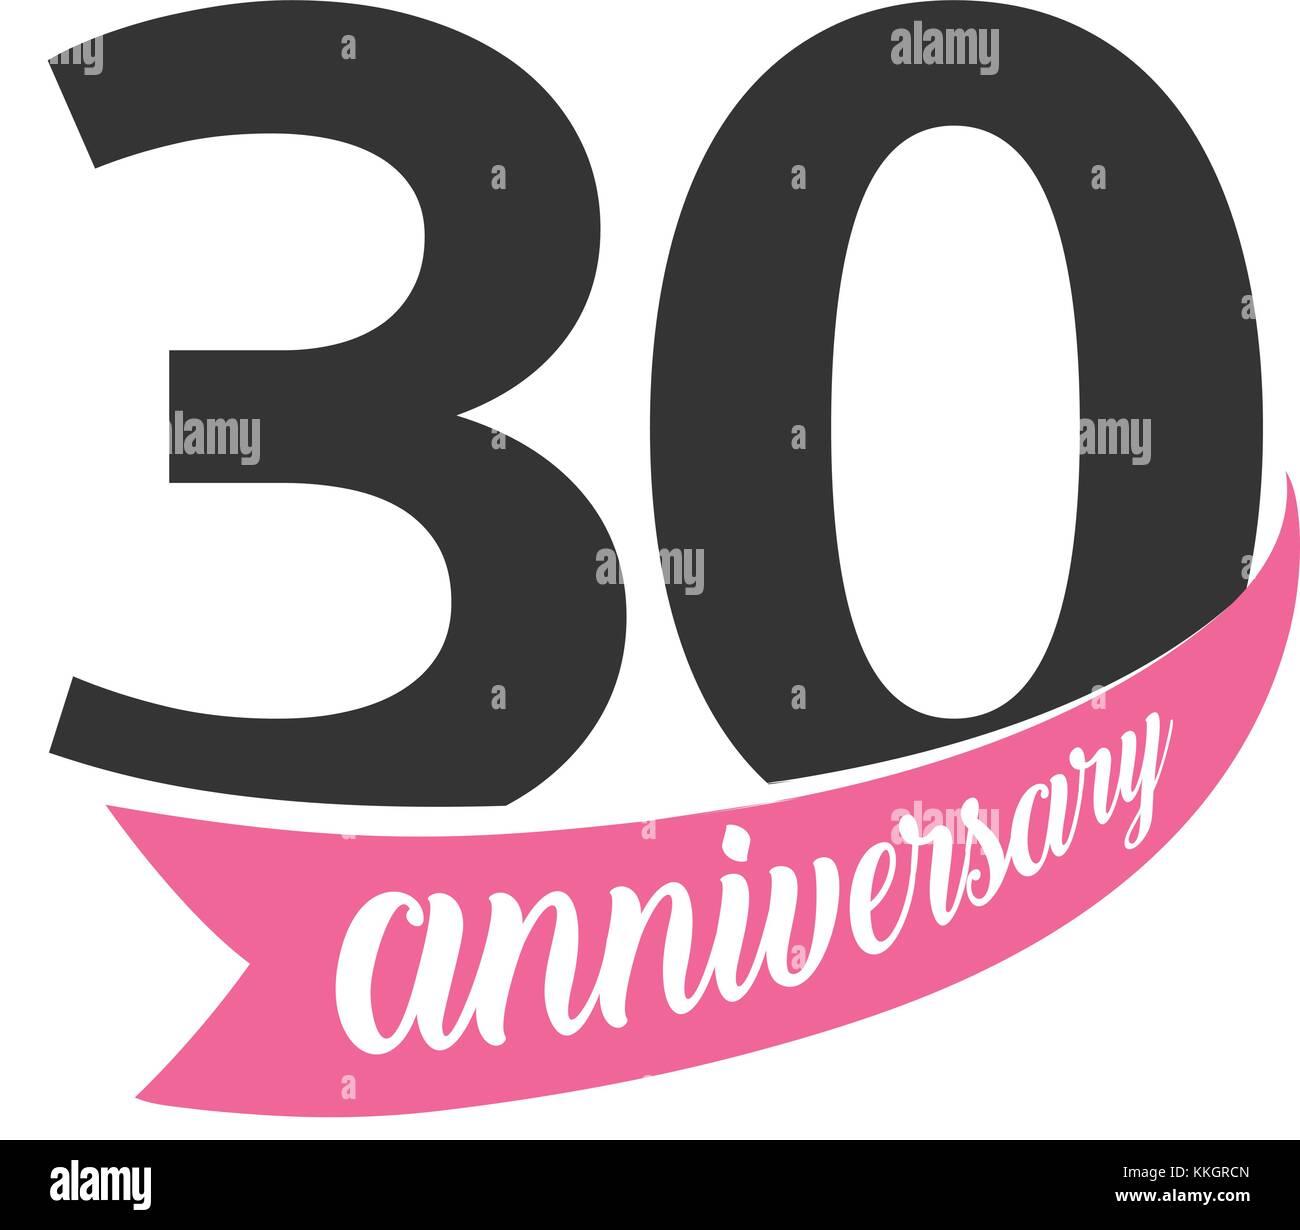 Trentesimo Anniversario Di Matrimonio.Trentesimo Anniversario Logo Vettoriale Numero 30 Illustrazione